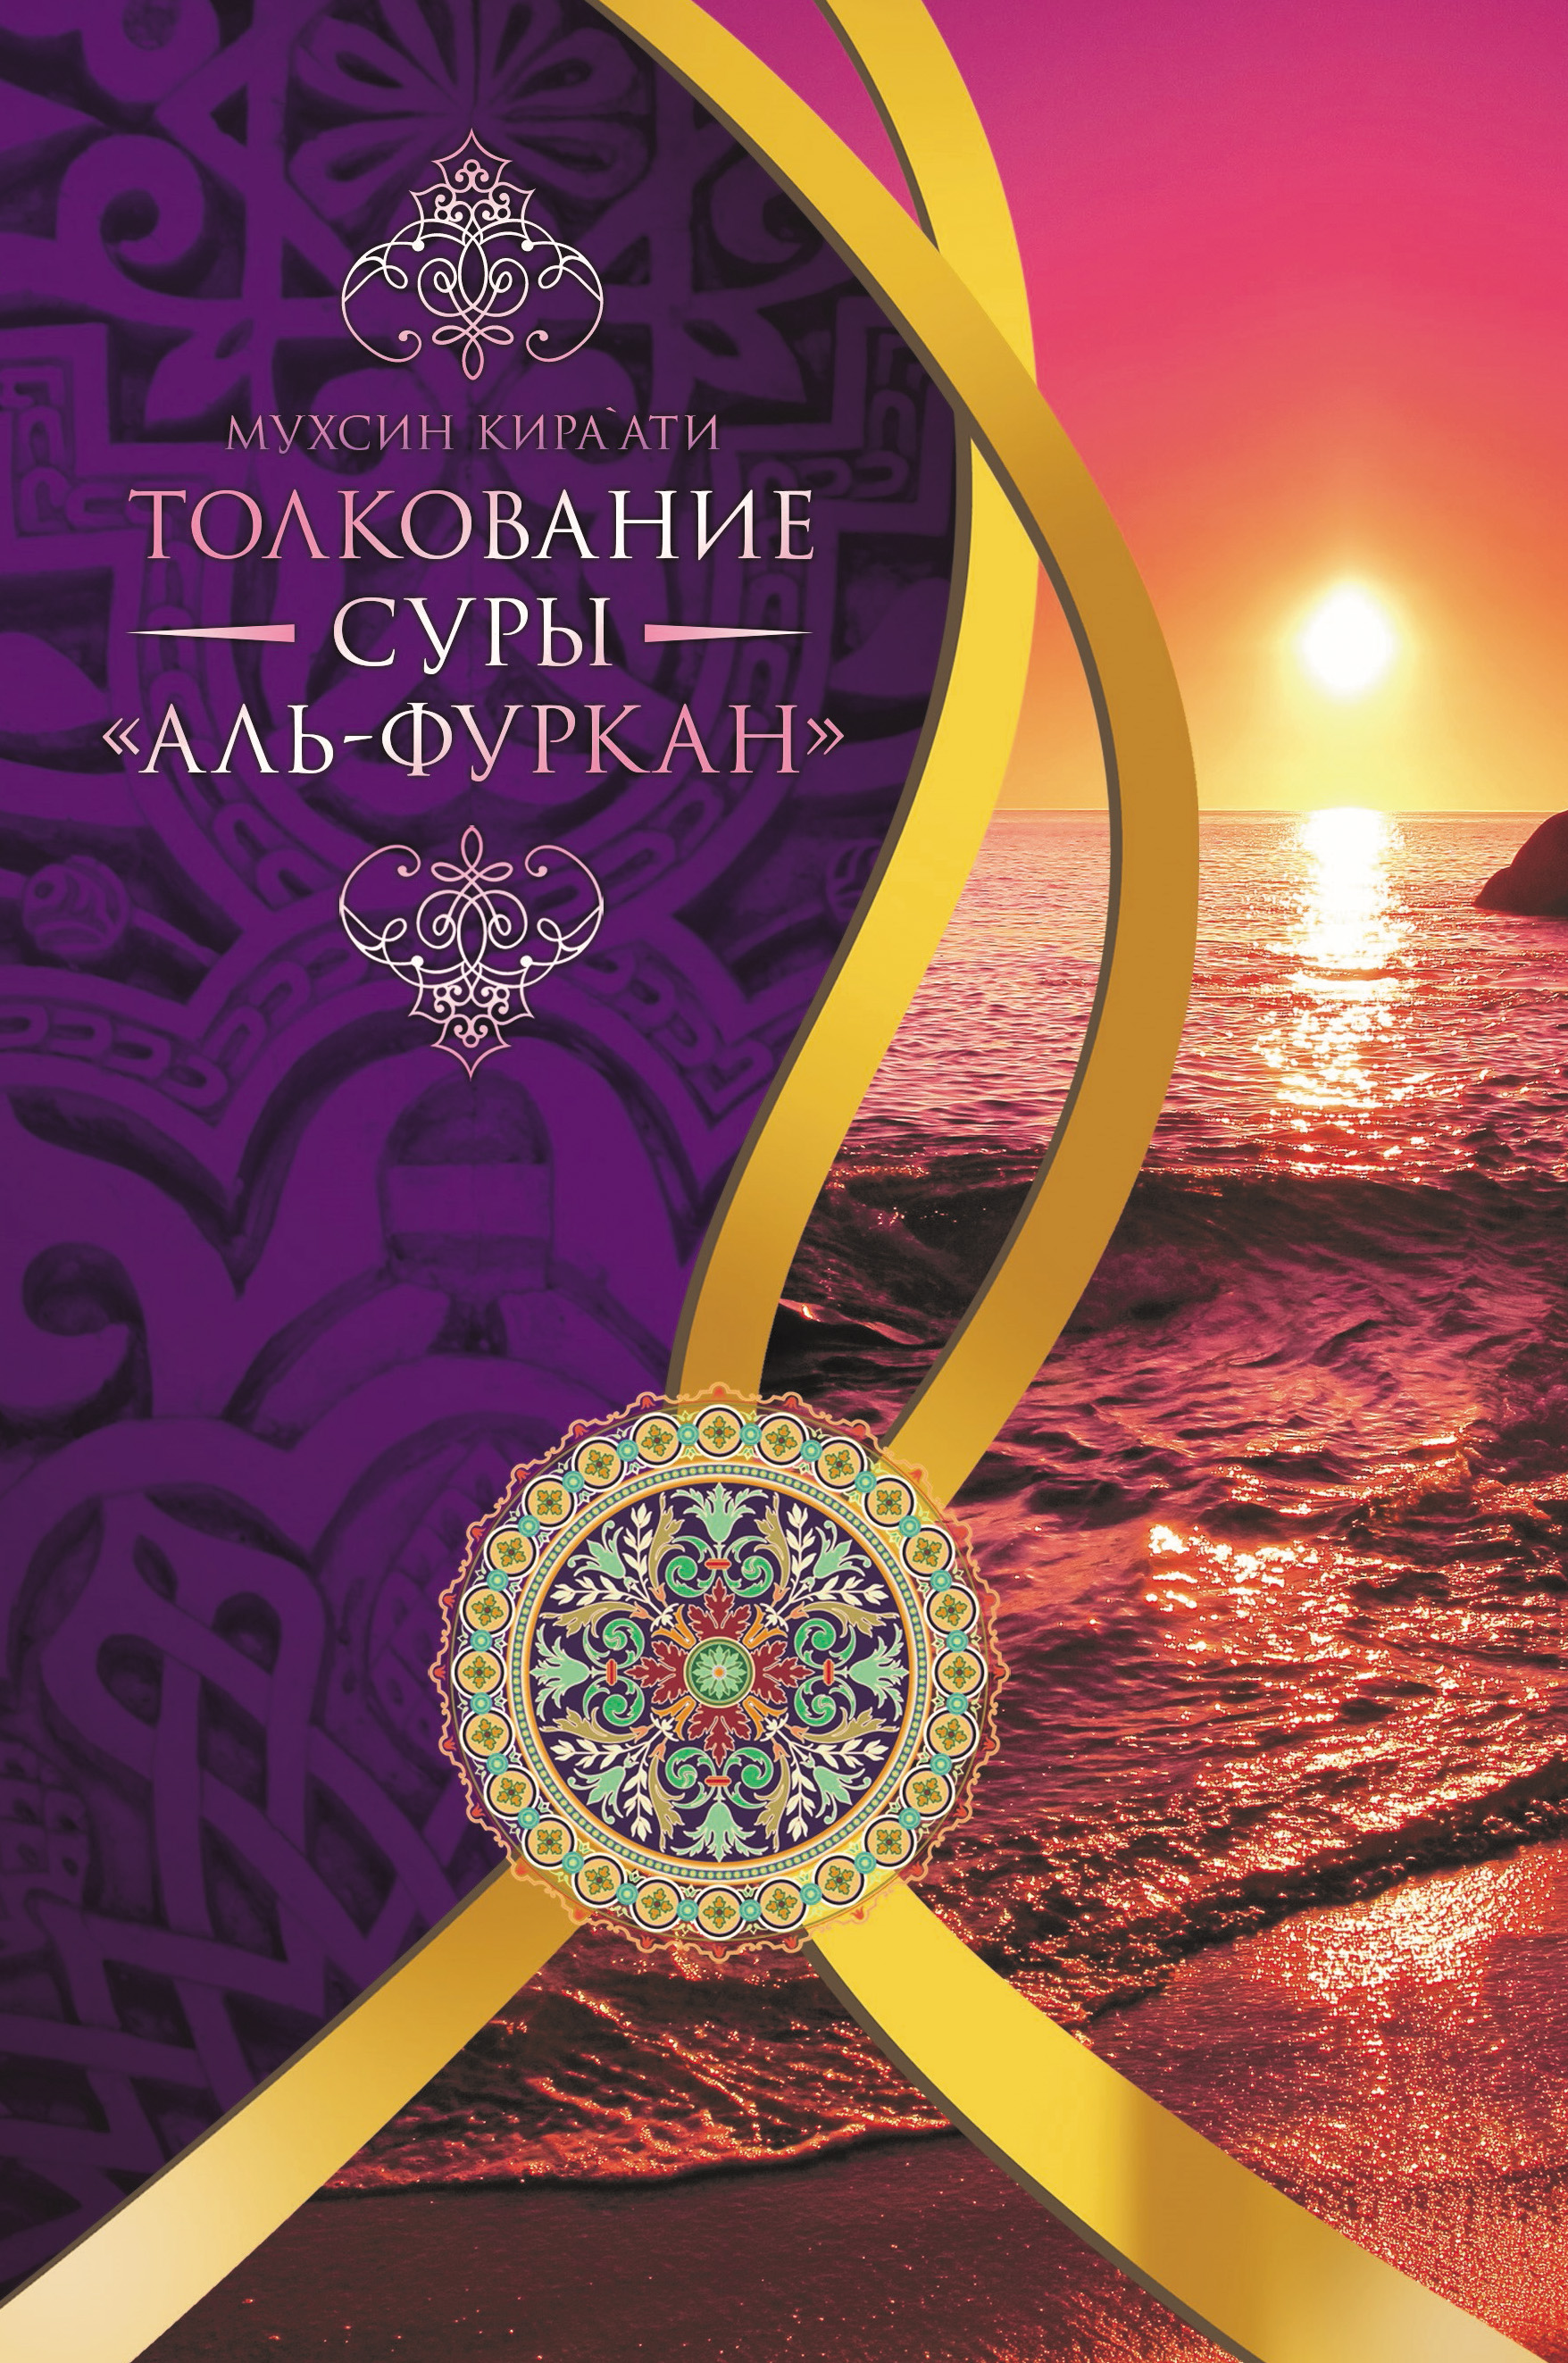 Мухсин Кира'ати Толкование суры «Ал-Фуркан» мустафа дилшад тихрани тематическое толкование нахдж ал балаги